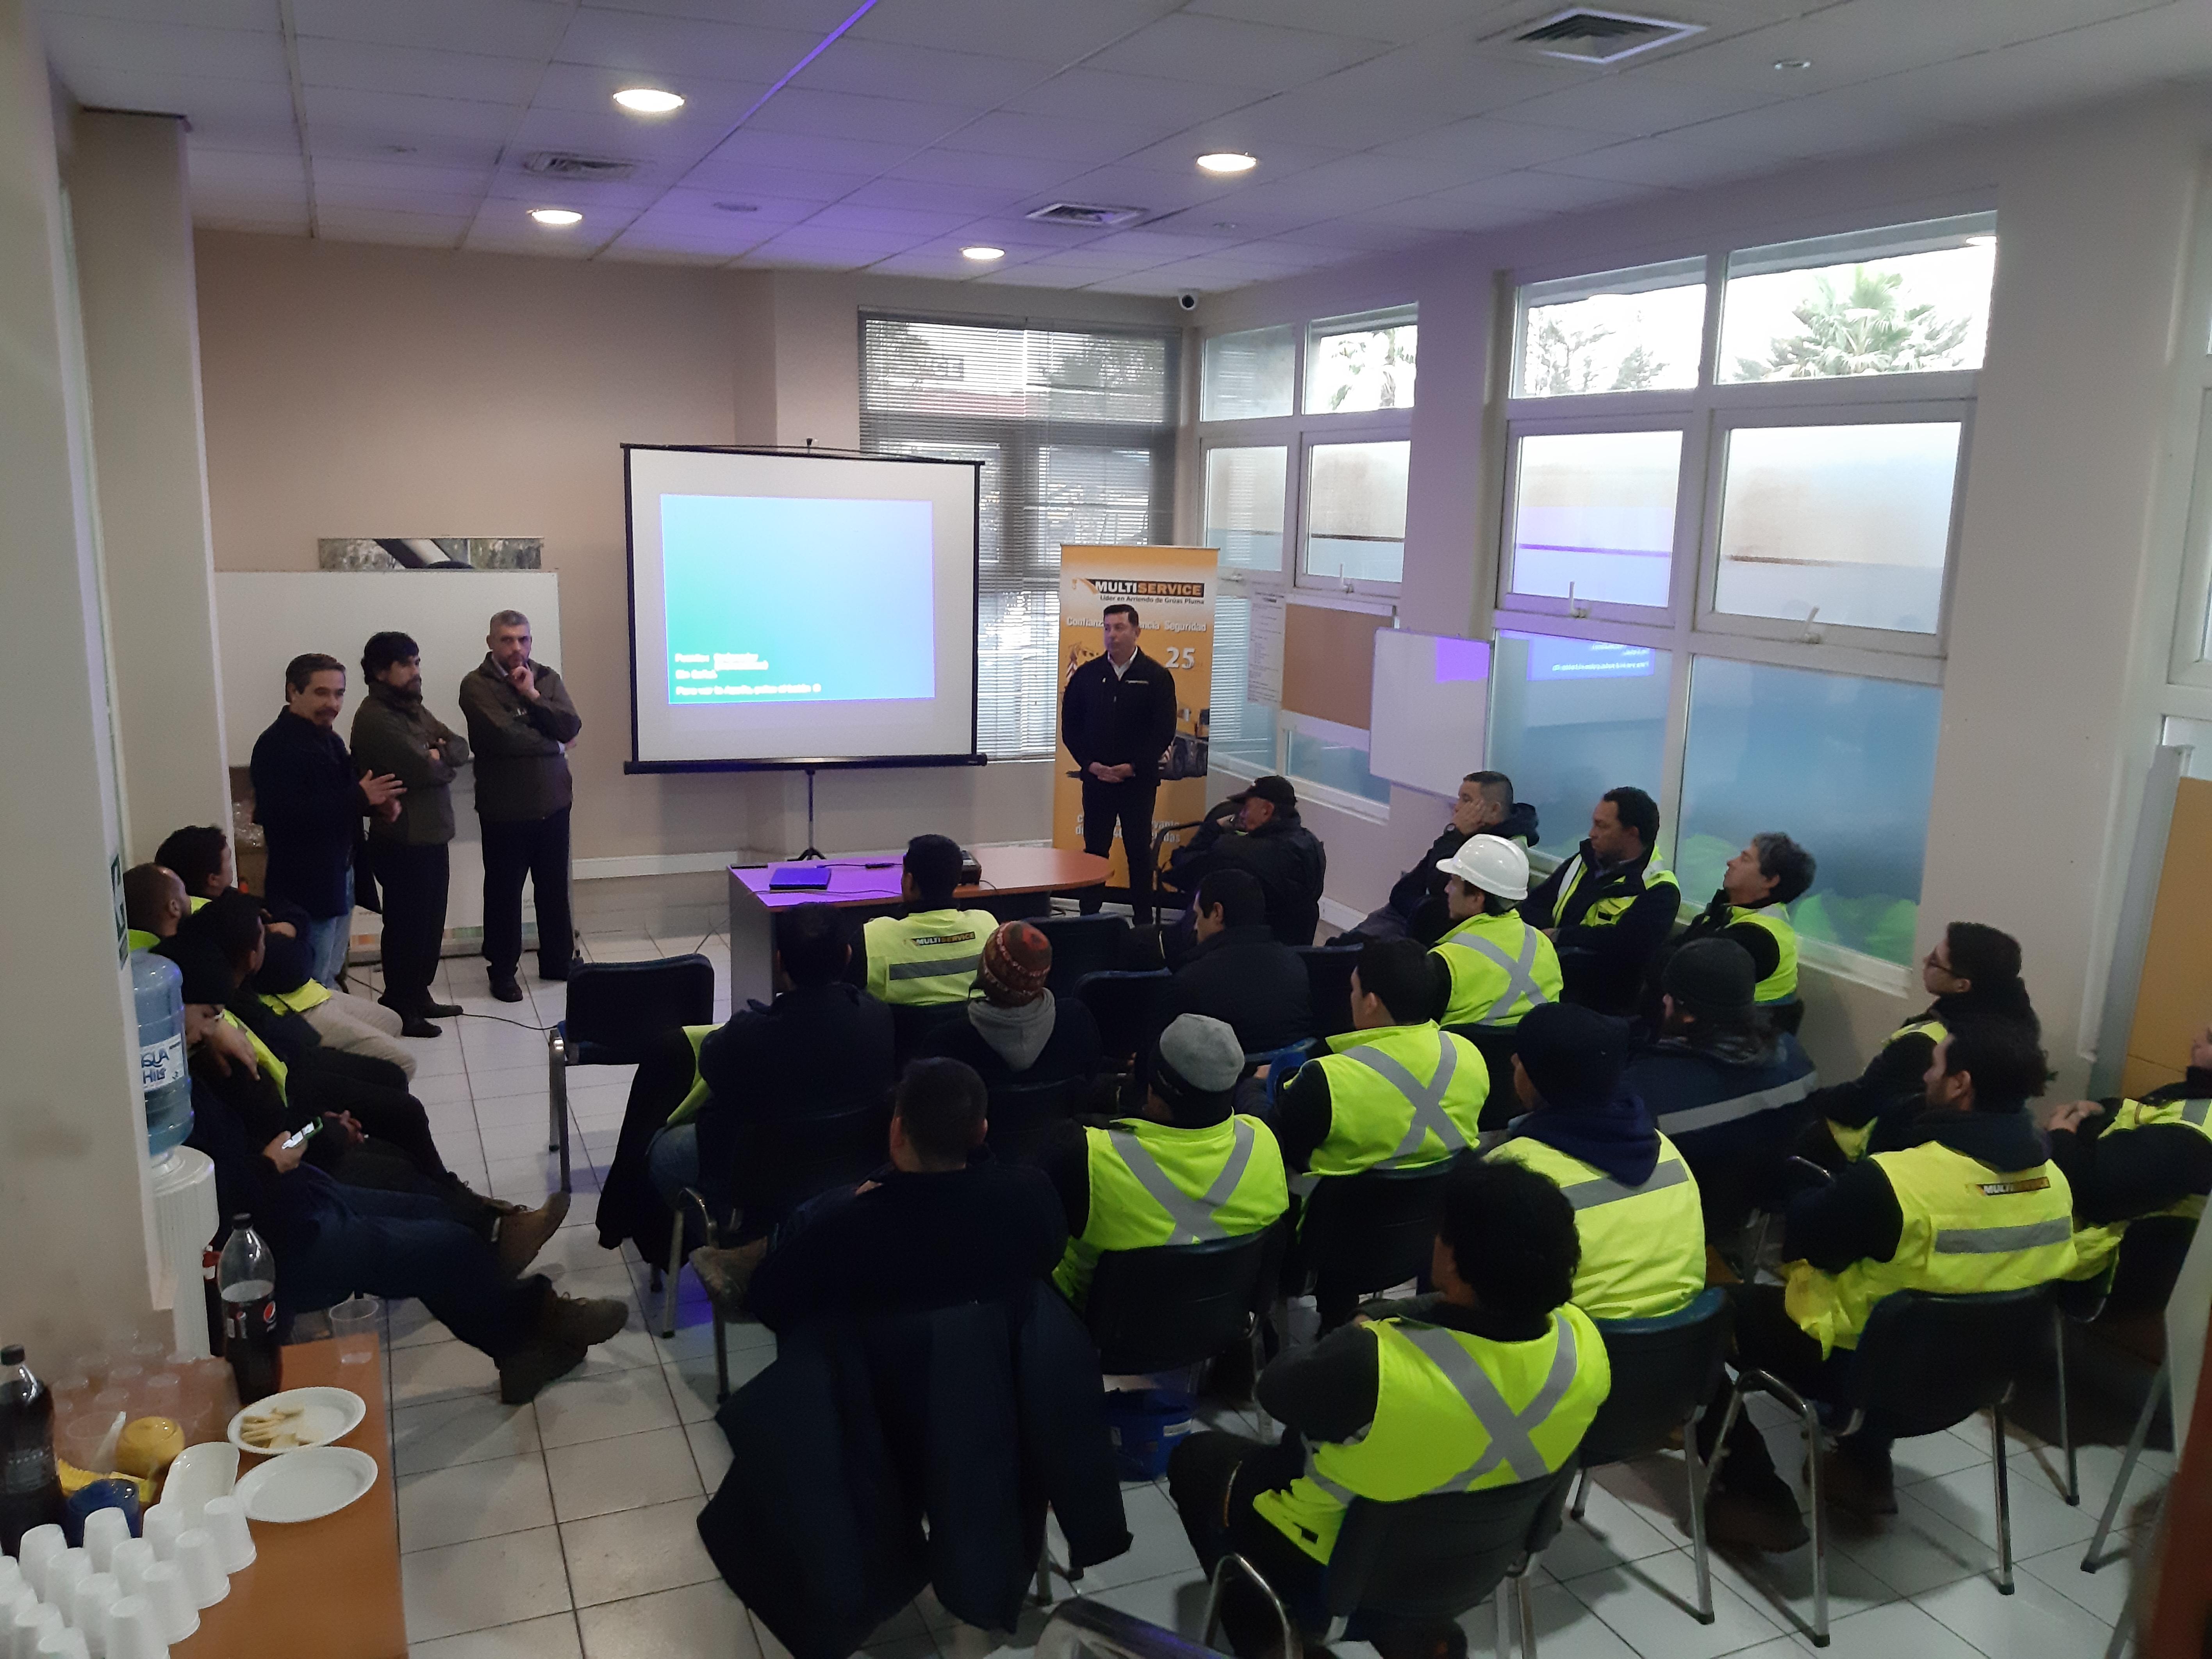 Charla NARCOTEST En Chile, Carabineros De Chile 14° Comisaría San Bernardo